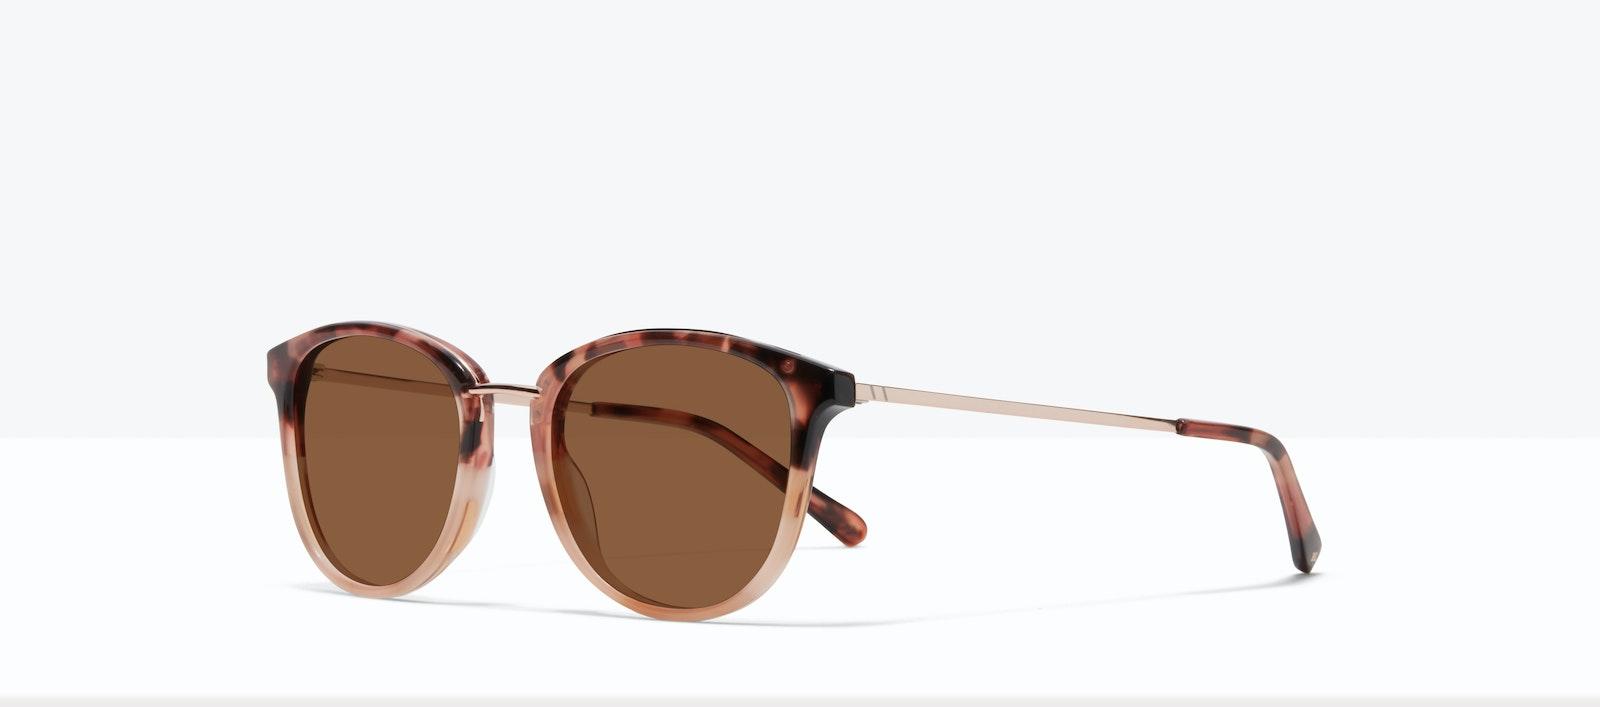 Affordable Fashion Glasses Square Round Sunglasses Women Bella M Two Tone Pink Tort Tilt